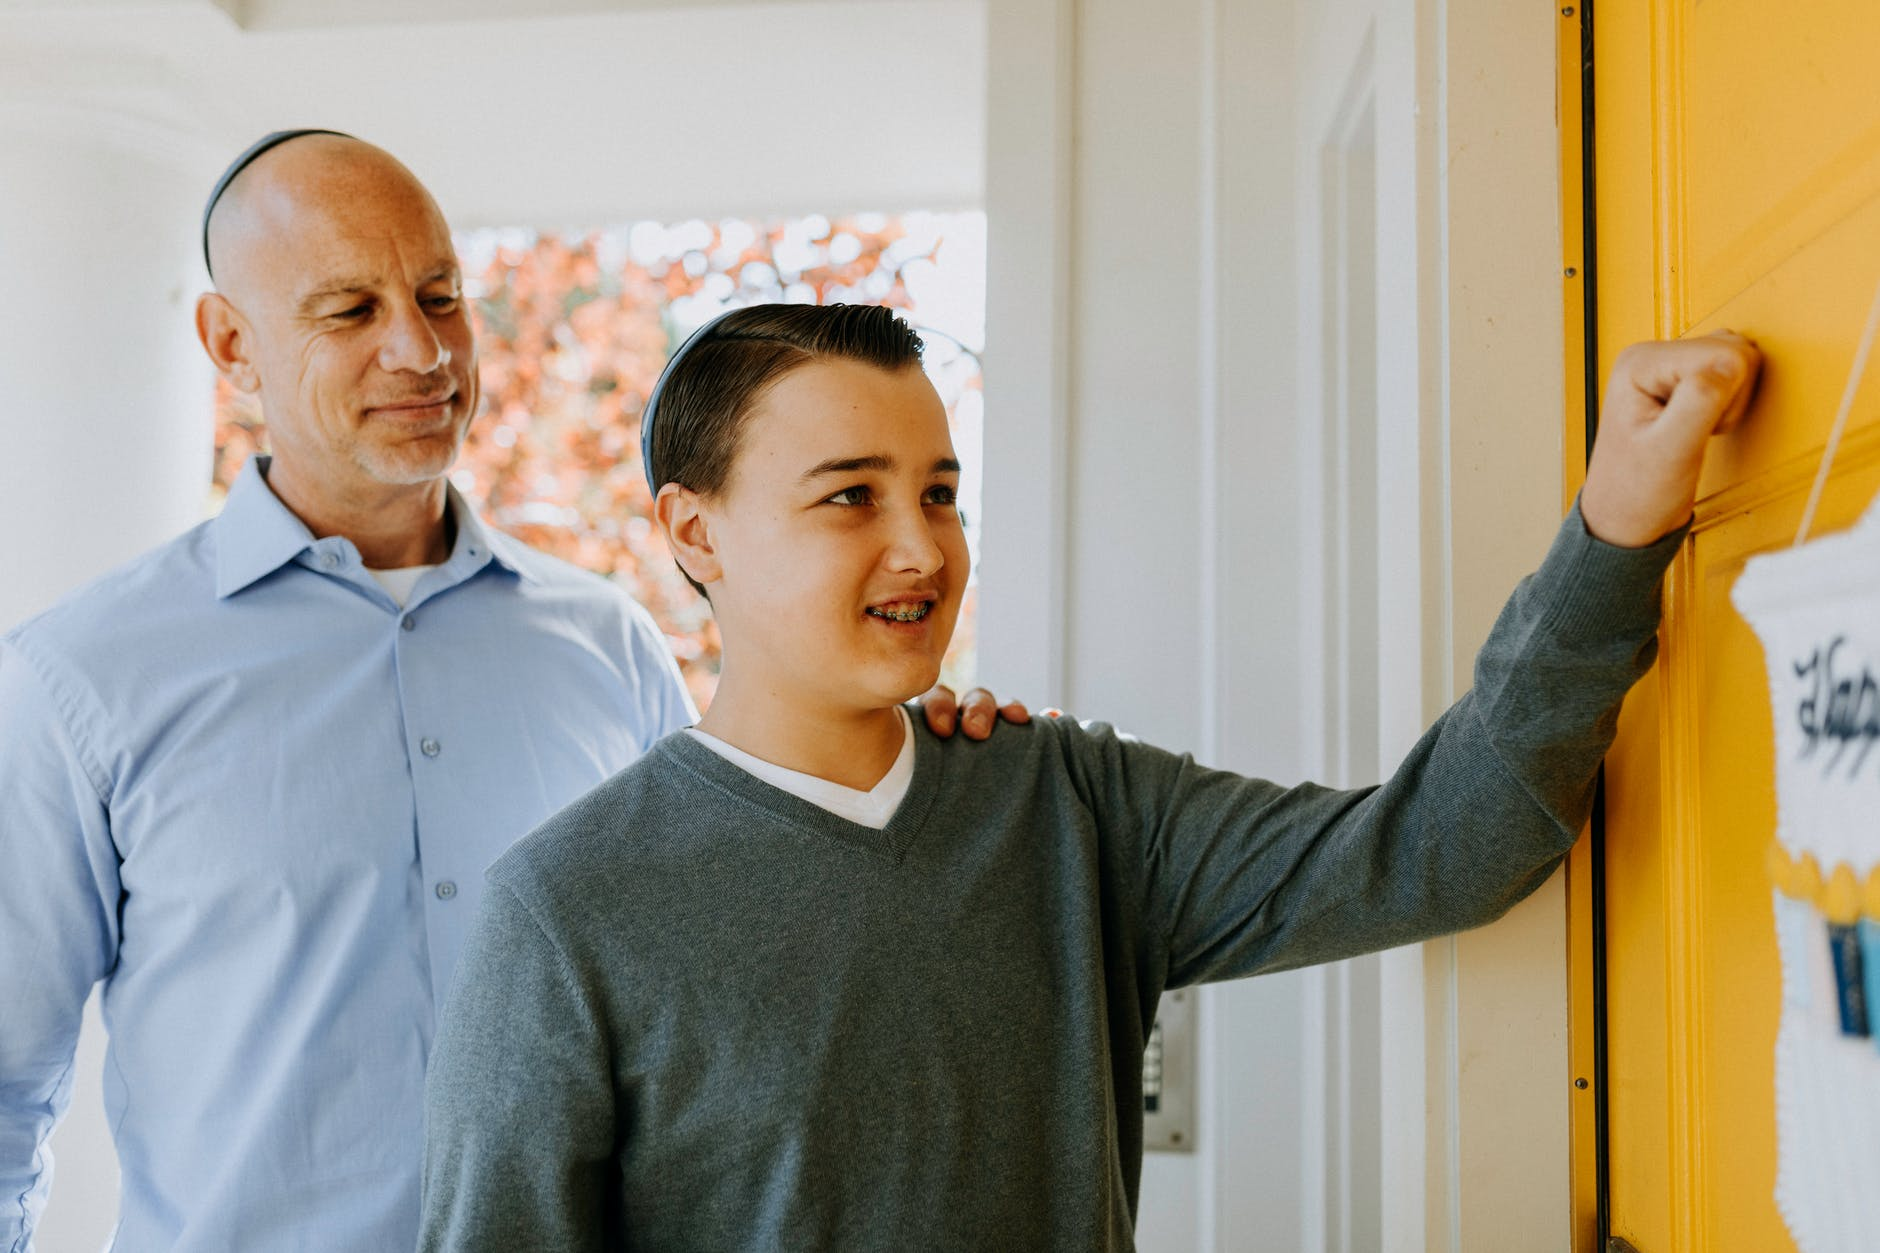 photo of boy knocking on the door